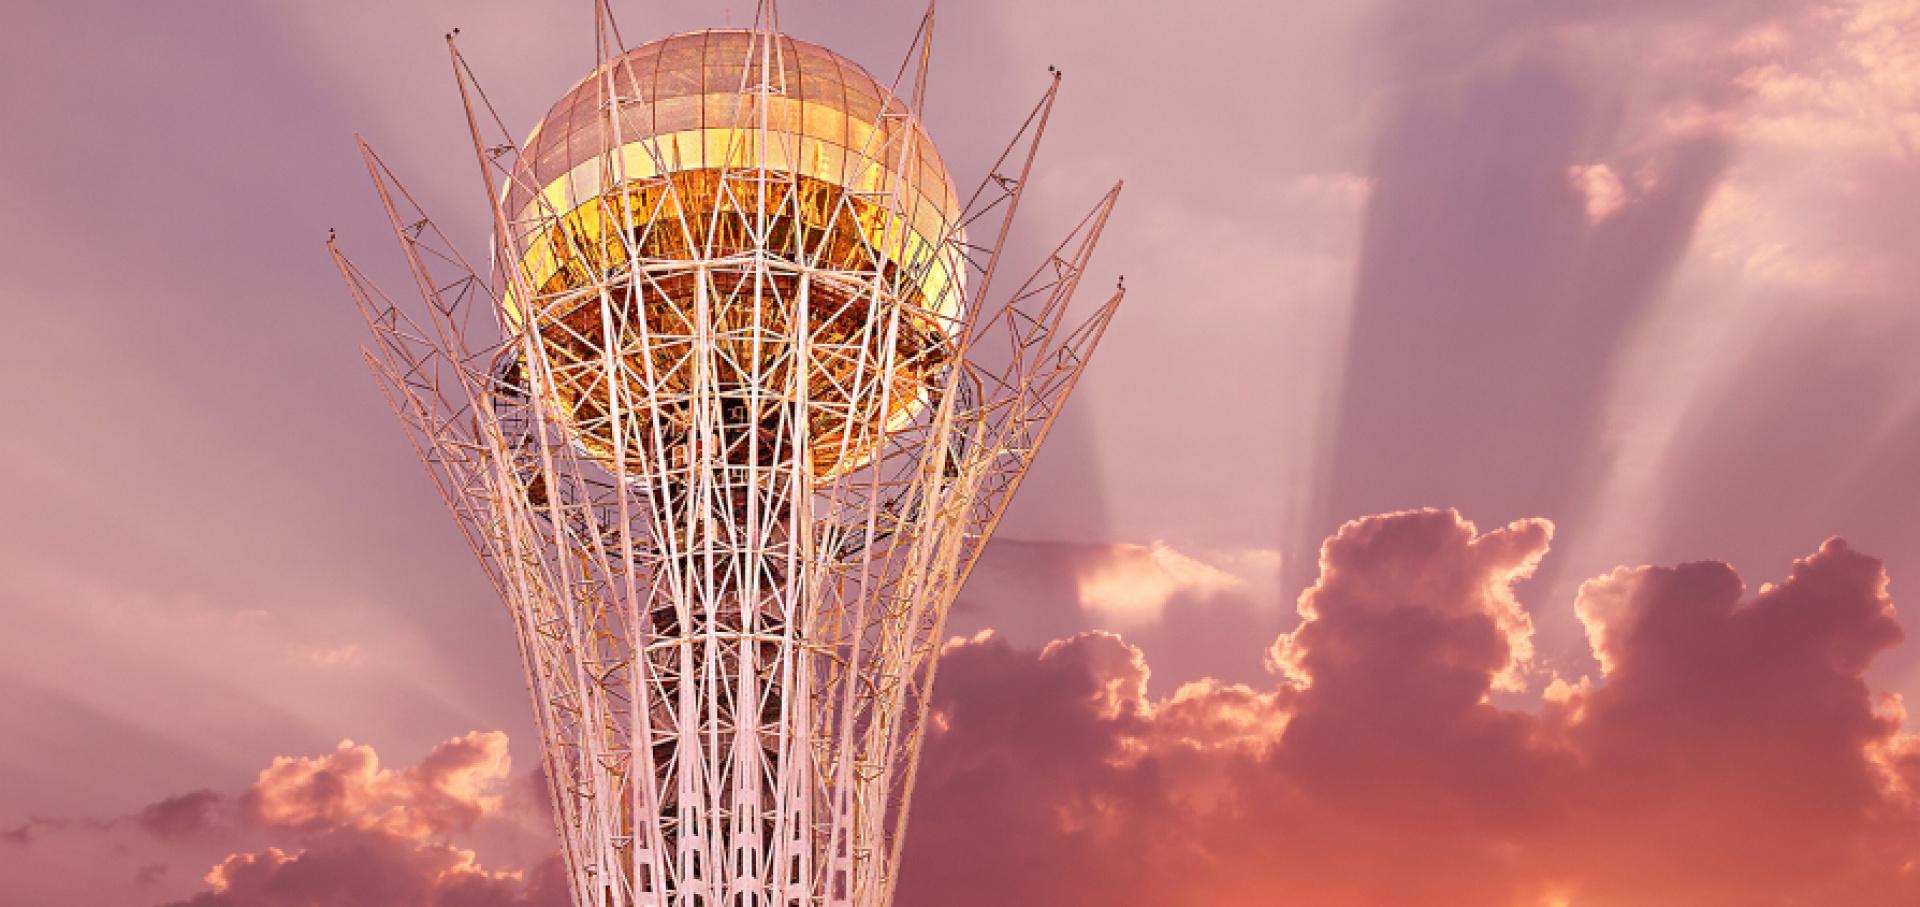 My Astana